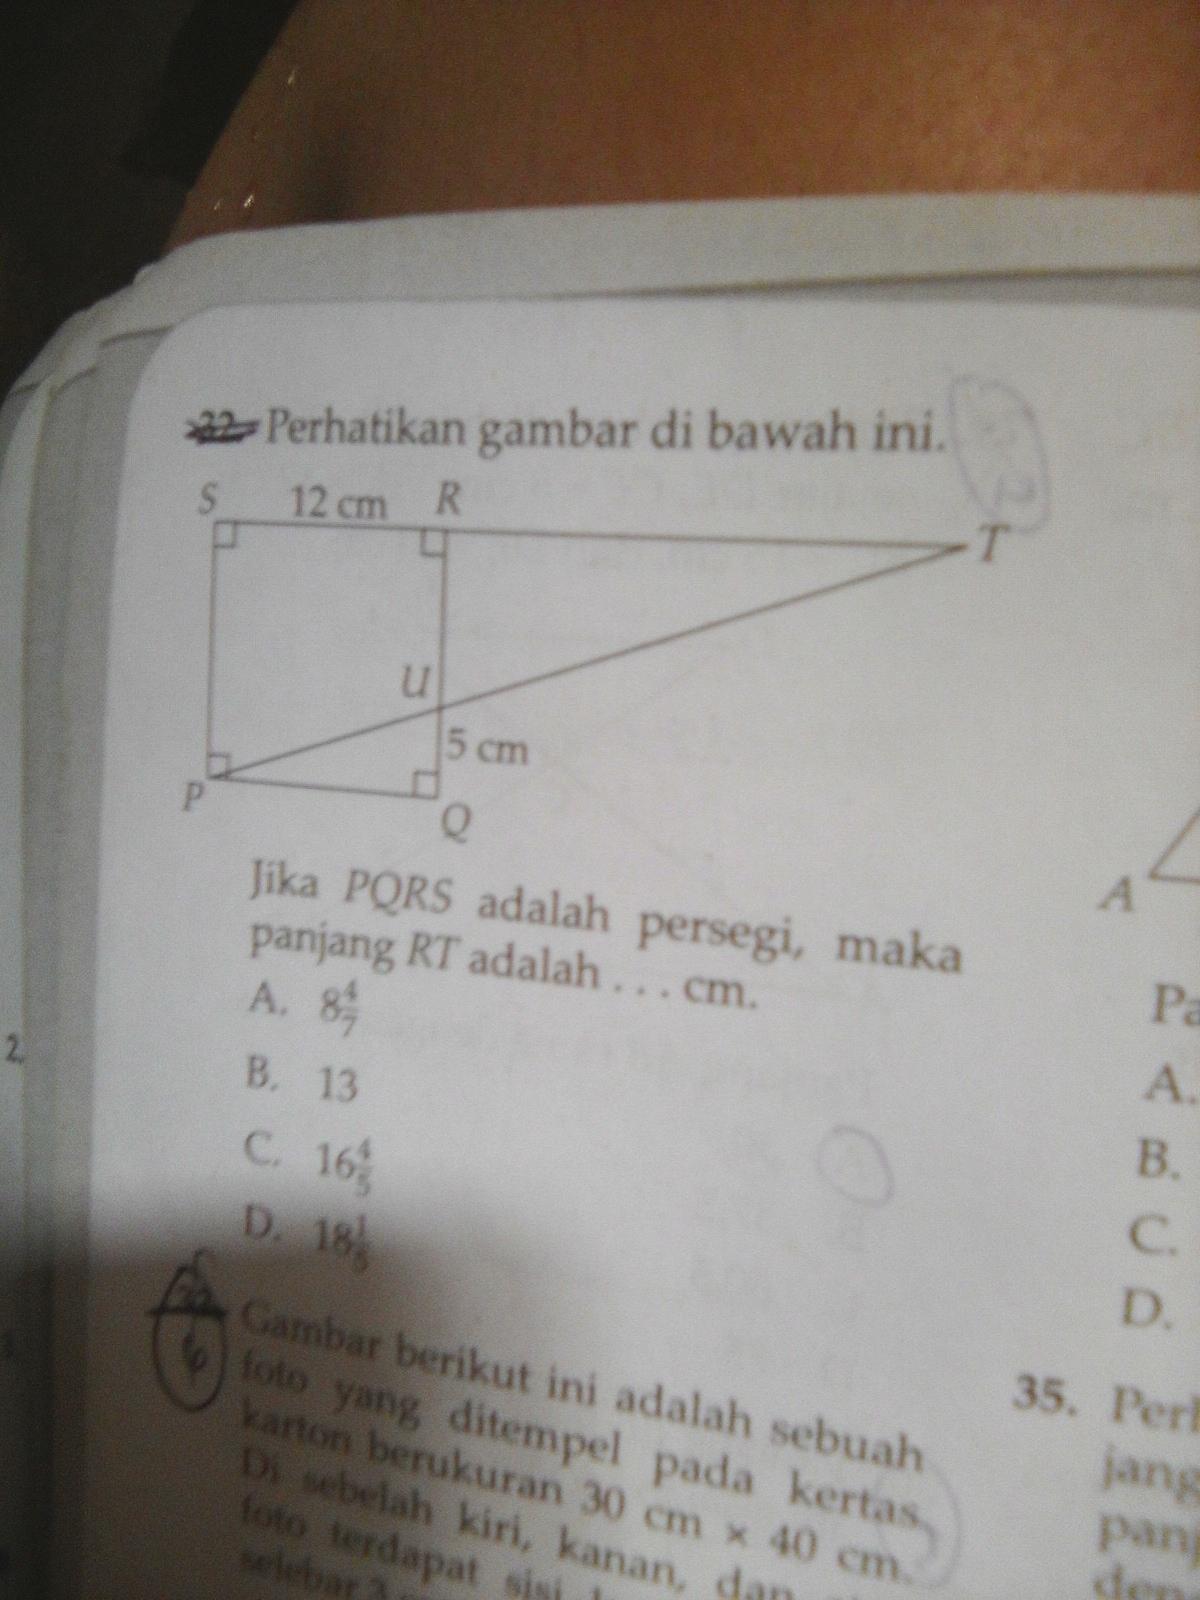 perhatikan gambar di bawah ini.jika PQRS adalah persegi ...